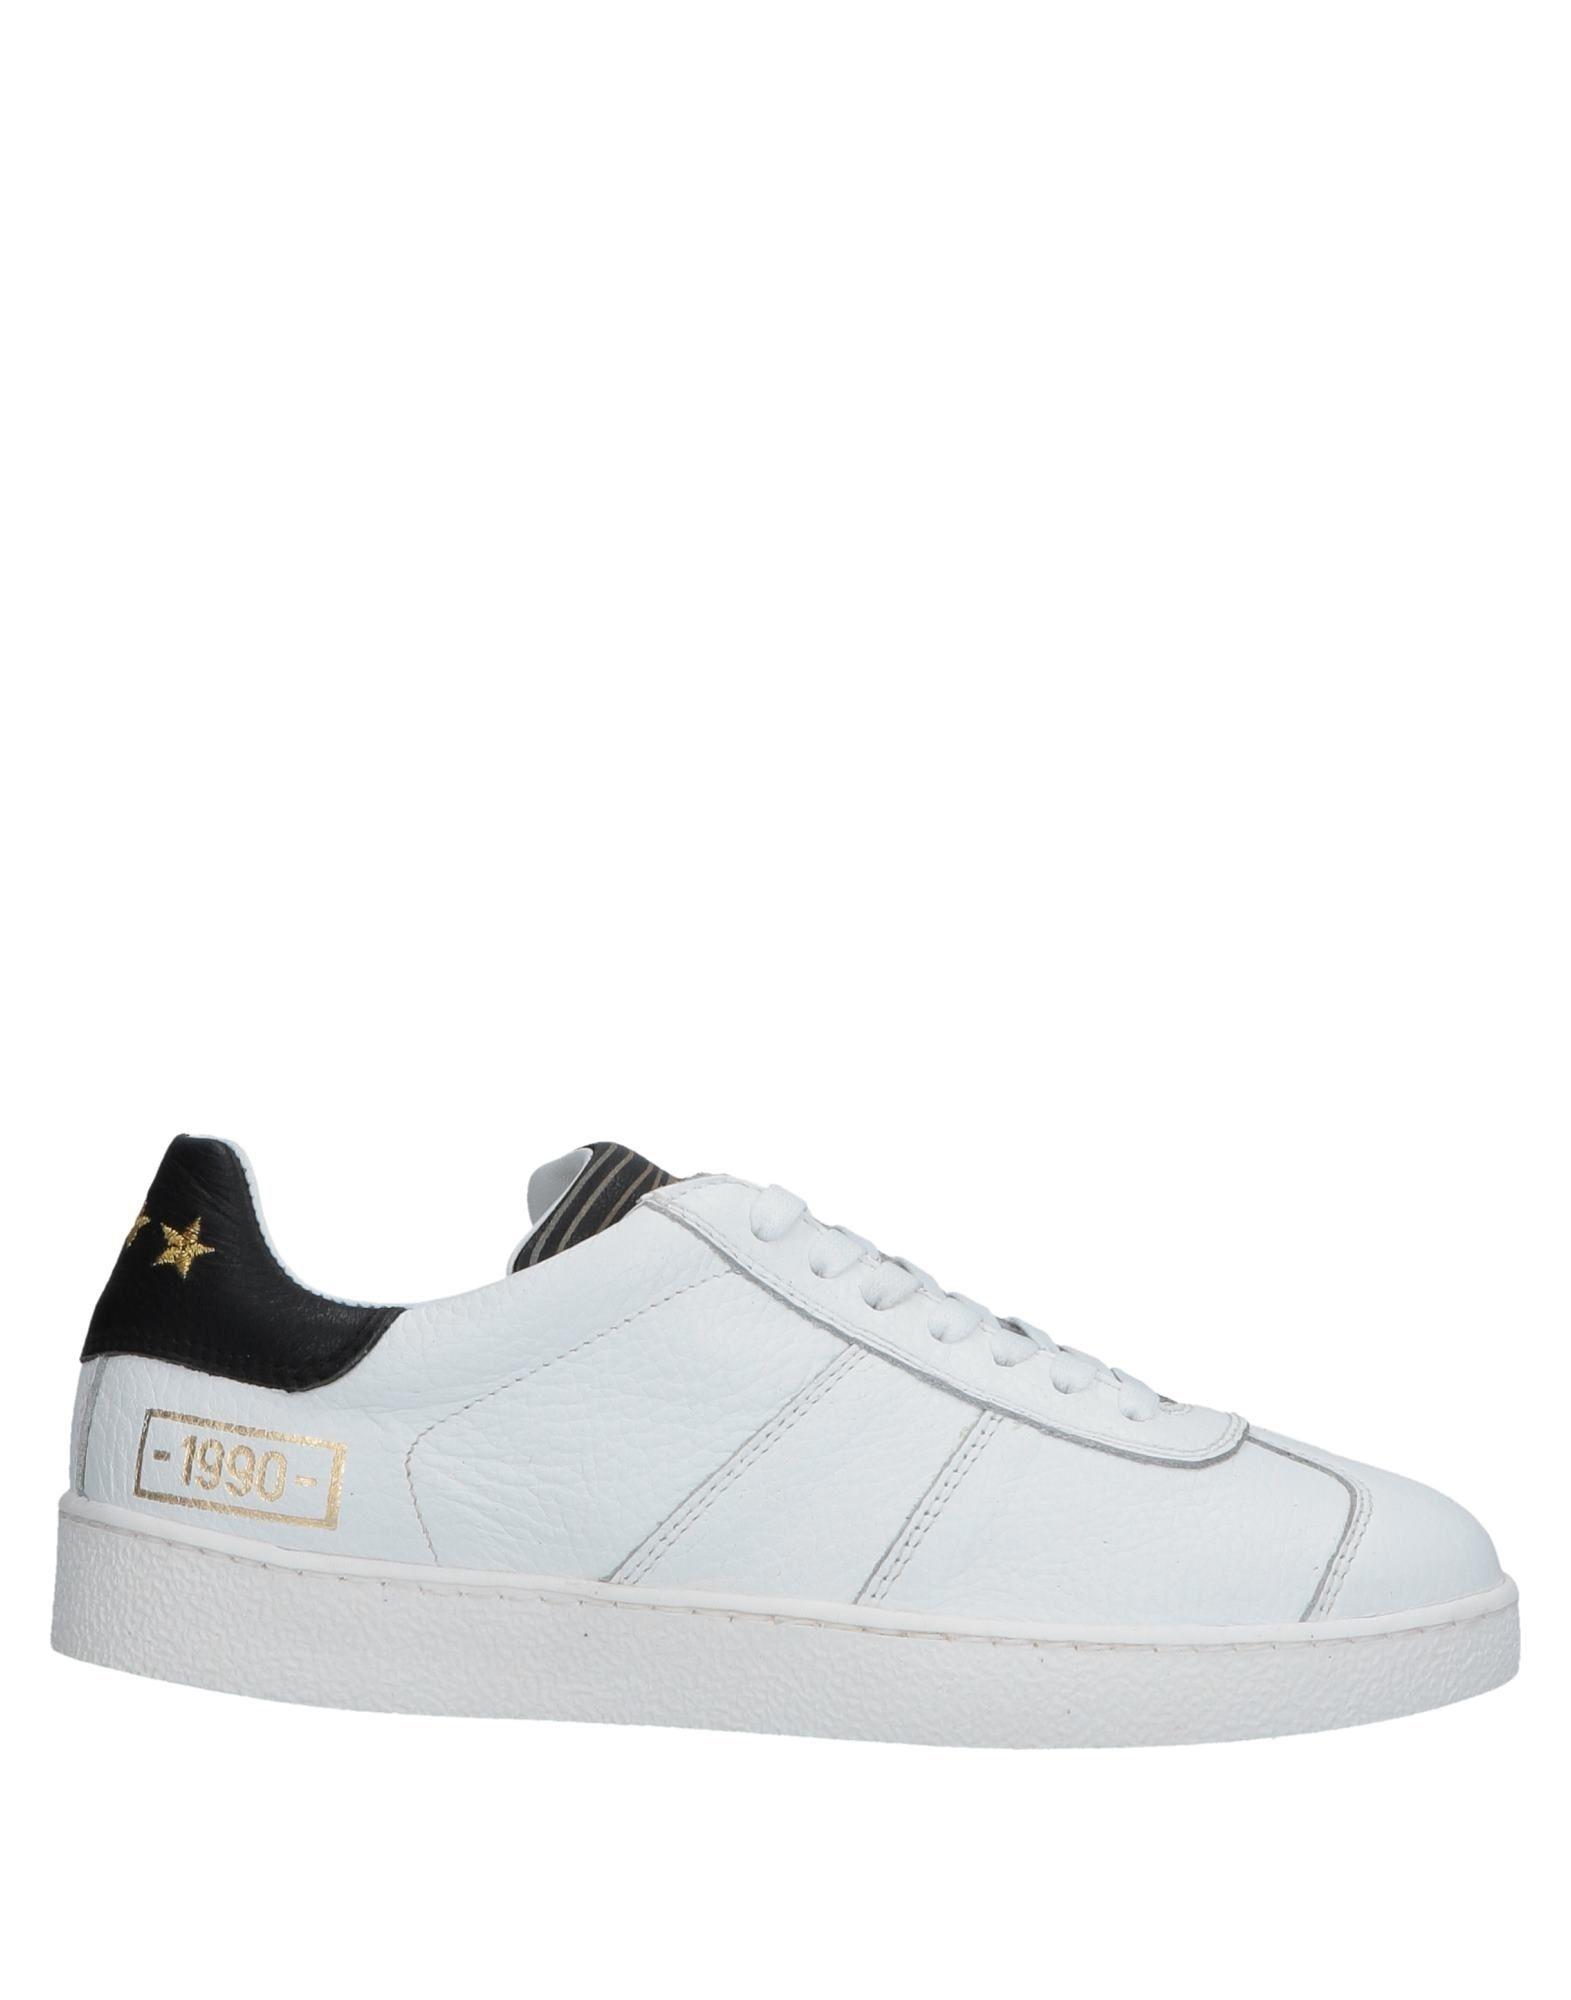 Pantofola D'oro Sneakers Sneakers - Women Pantofola D'oro Sneakers Sneakers online on  United Kingdom - 11570079IT cf3518